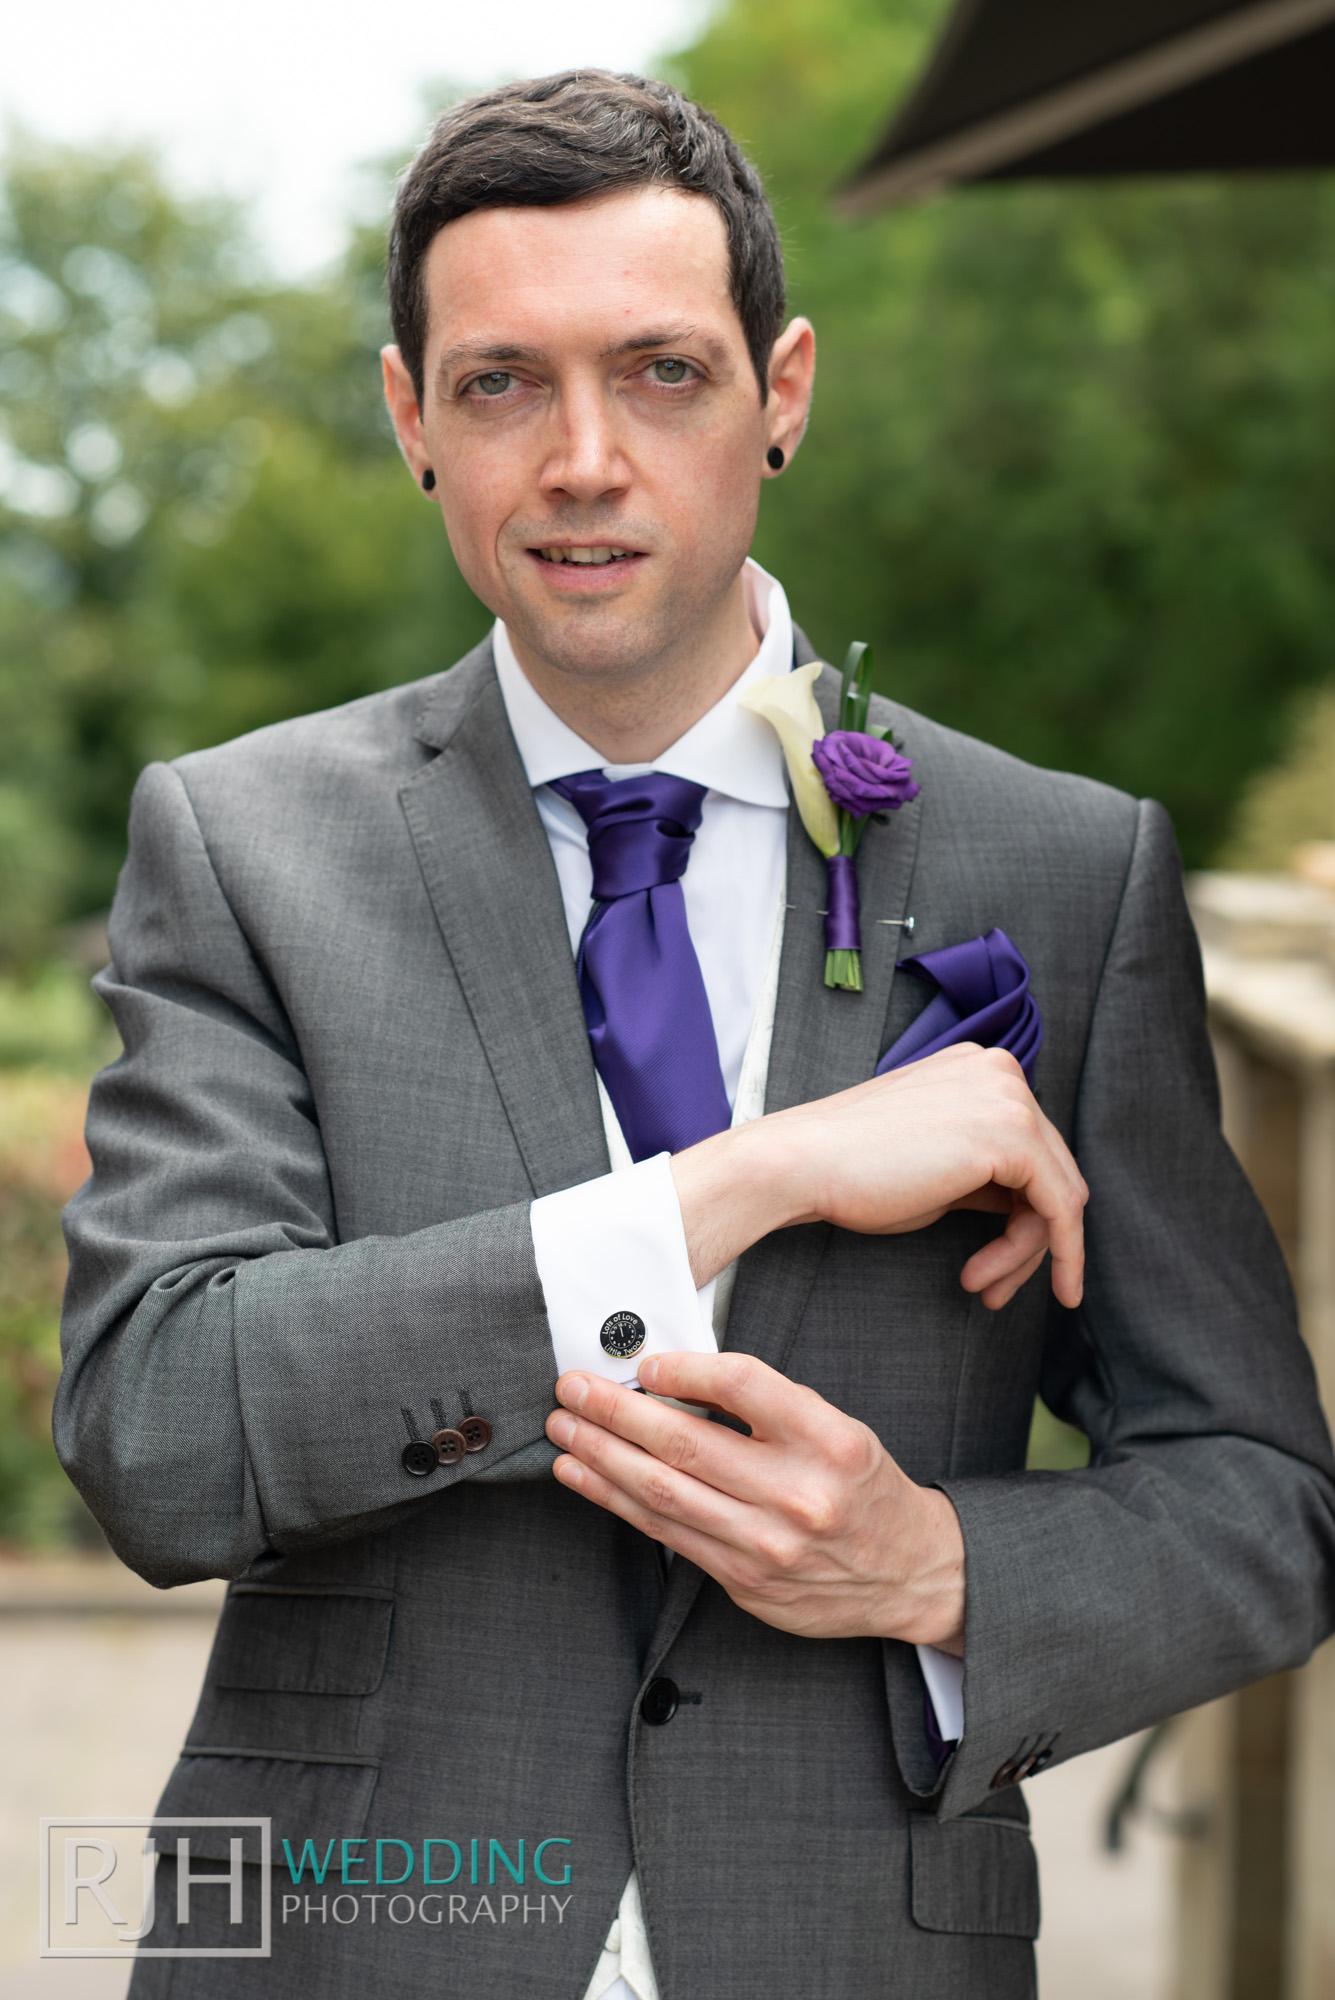 Oulton Hall Wedding Photography_Goodwill-Hall_012_DSC_3081.jpg